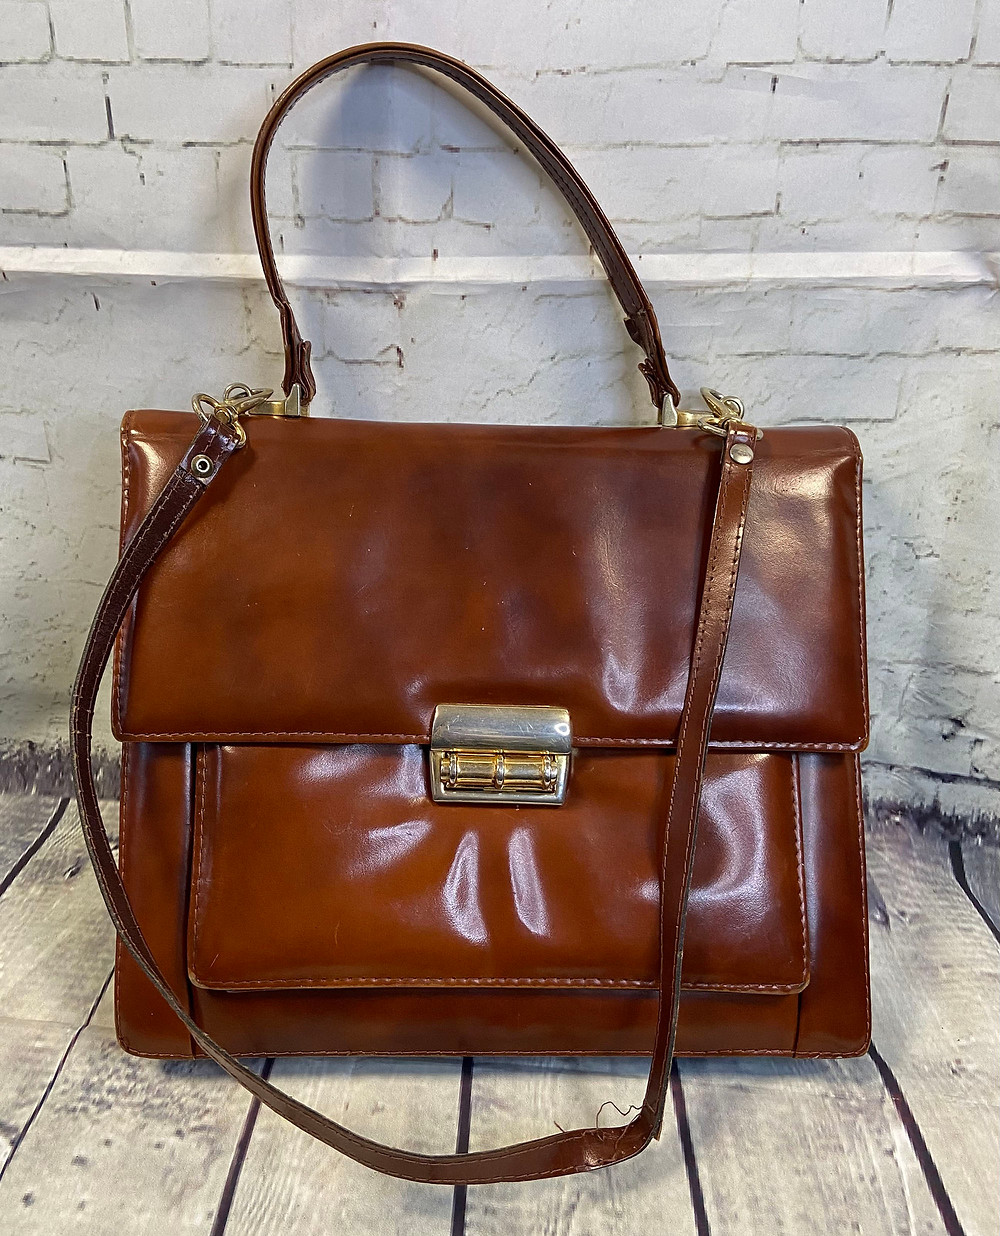 1970s Vintage Tan Leather Satchel Bag £32